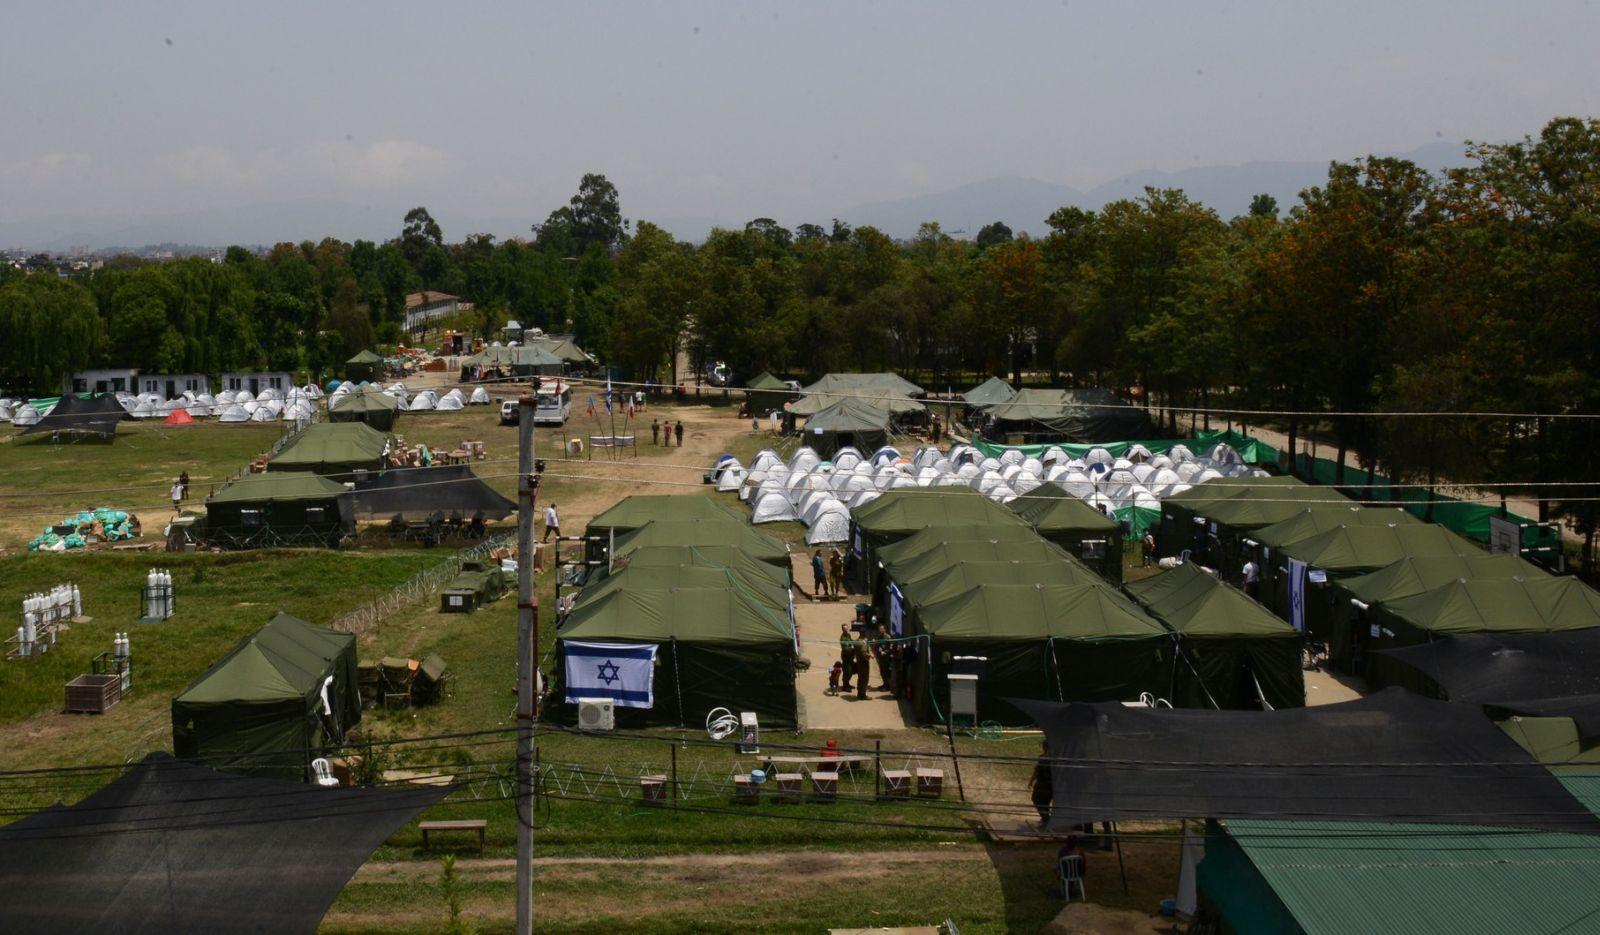 The IDF field hospital in Nepal. Photo: courtesy